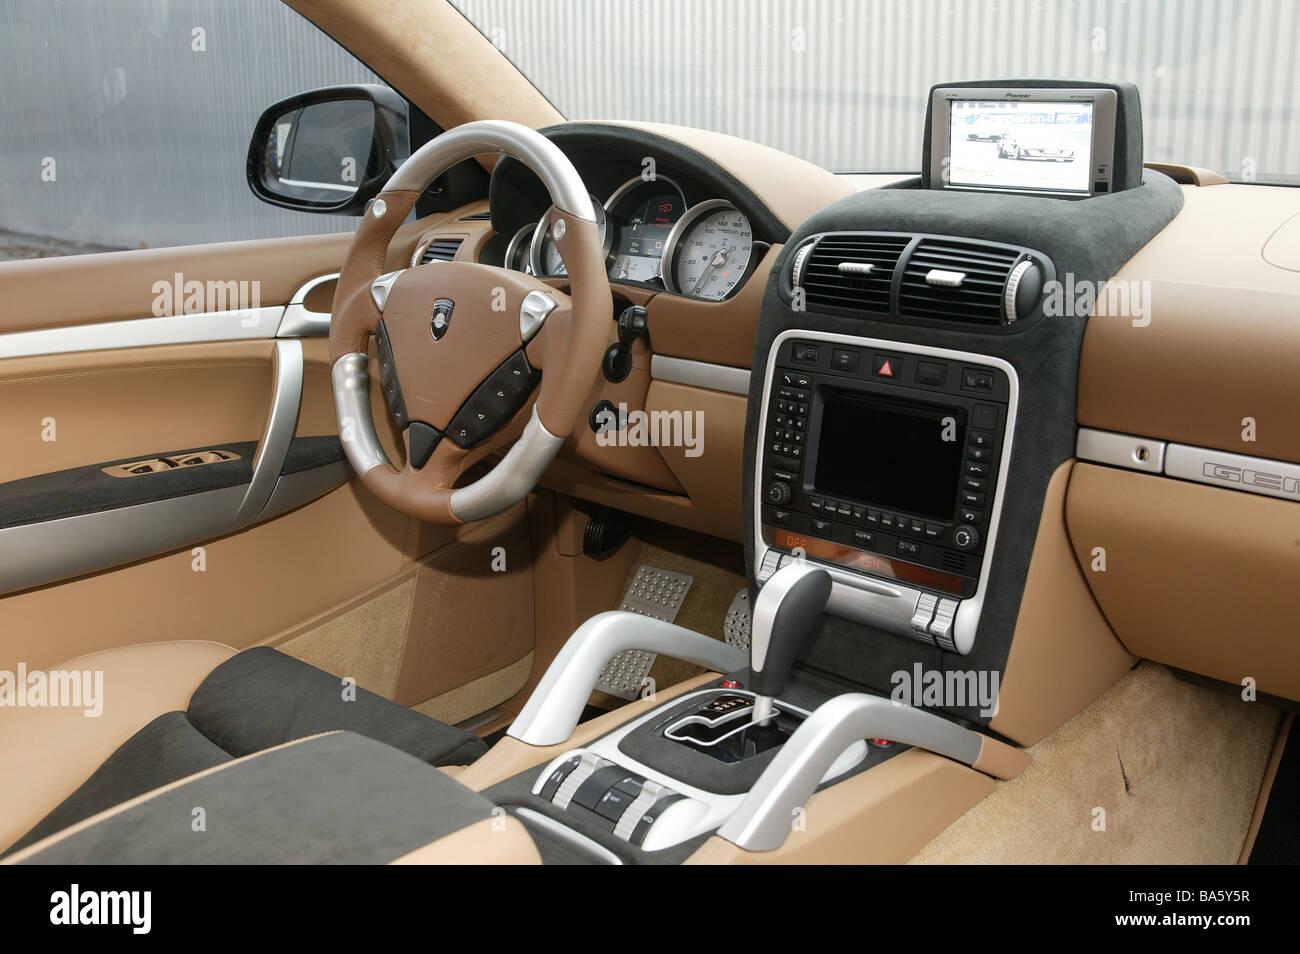 Car interior entertainment - Car Porsche Gemballa Gtr 700 Dashboard Car Entertainment Monitor No Property Release Vehicle Private Car Sport Cars Interior